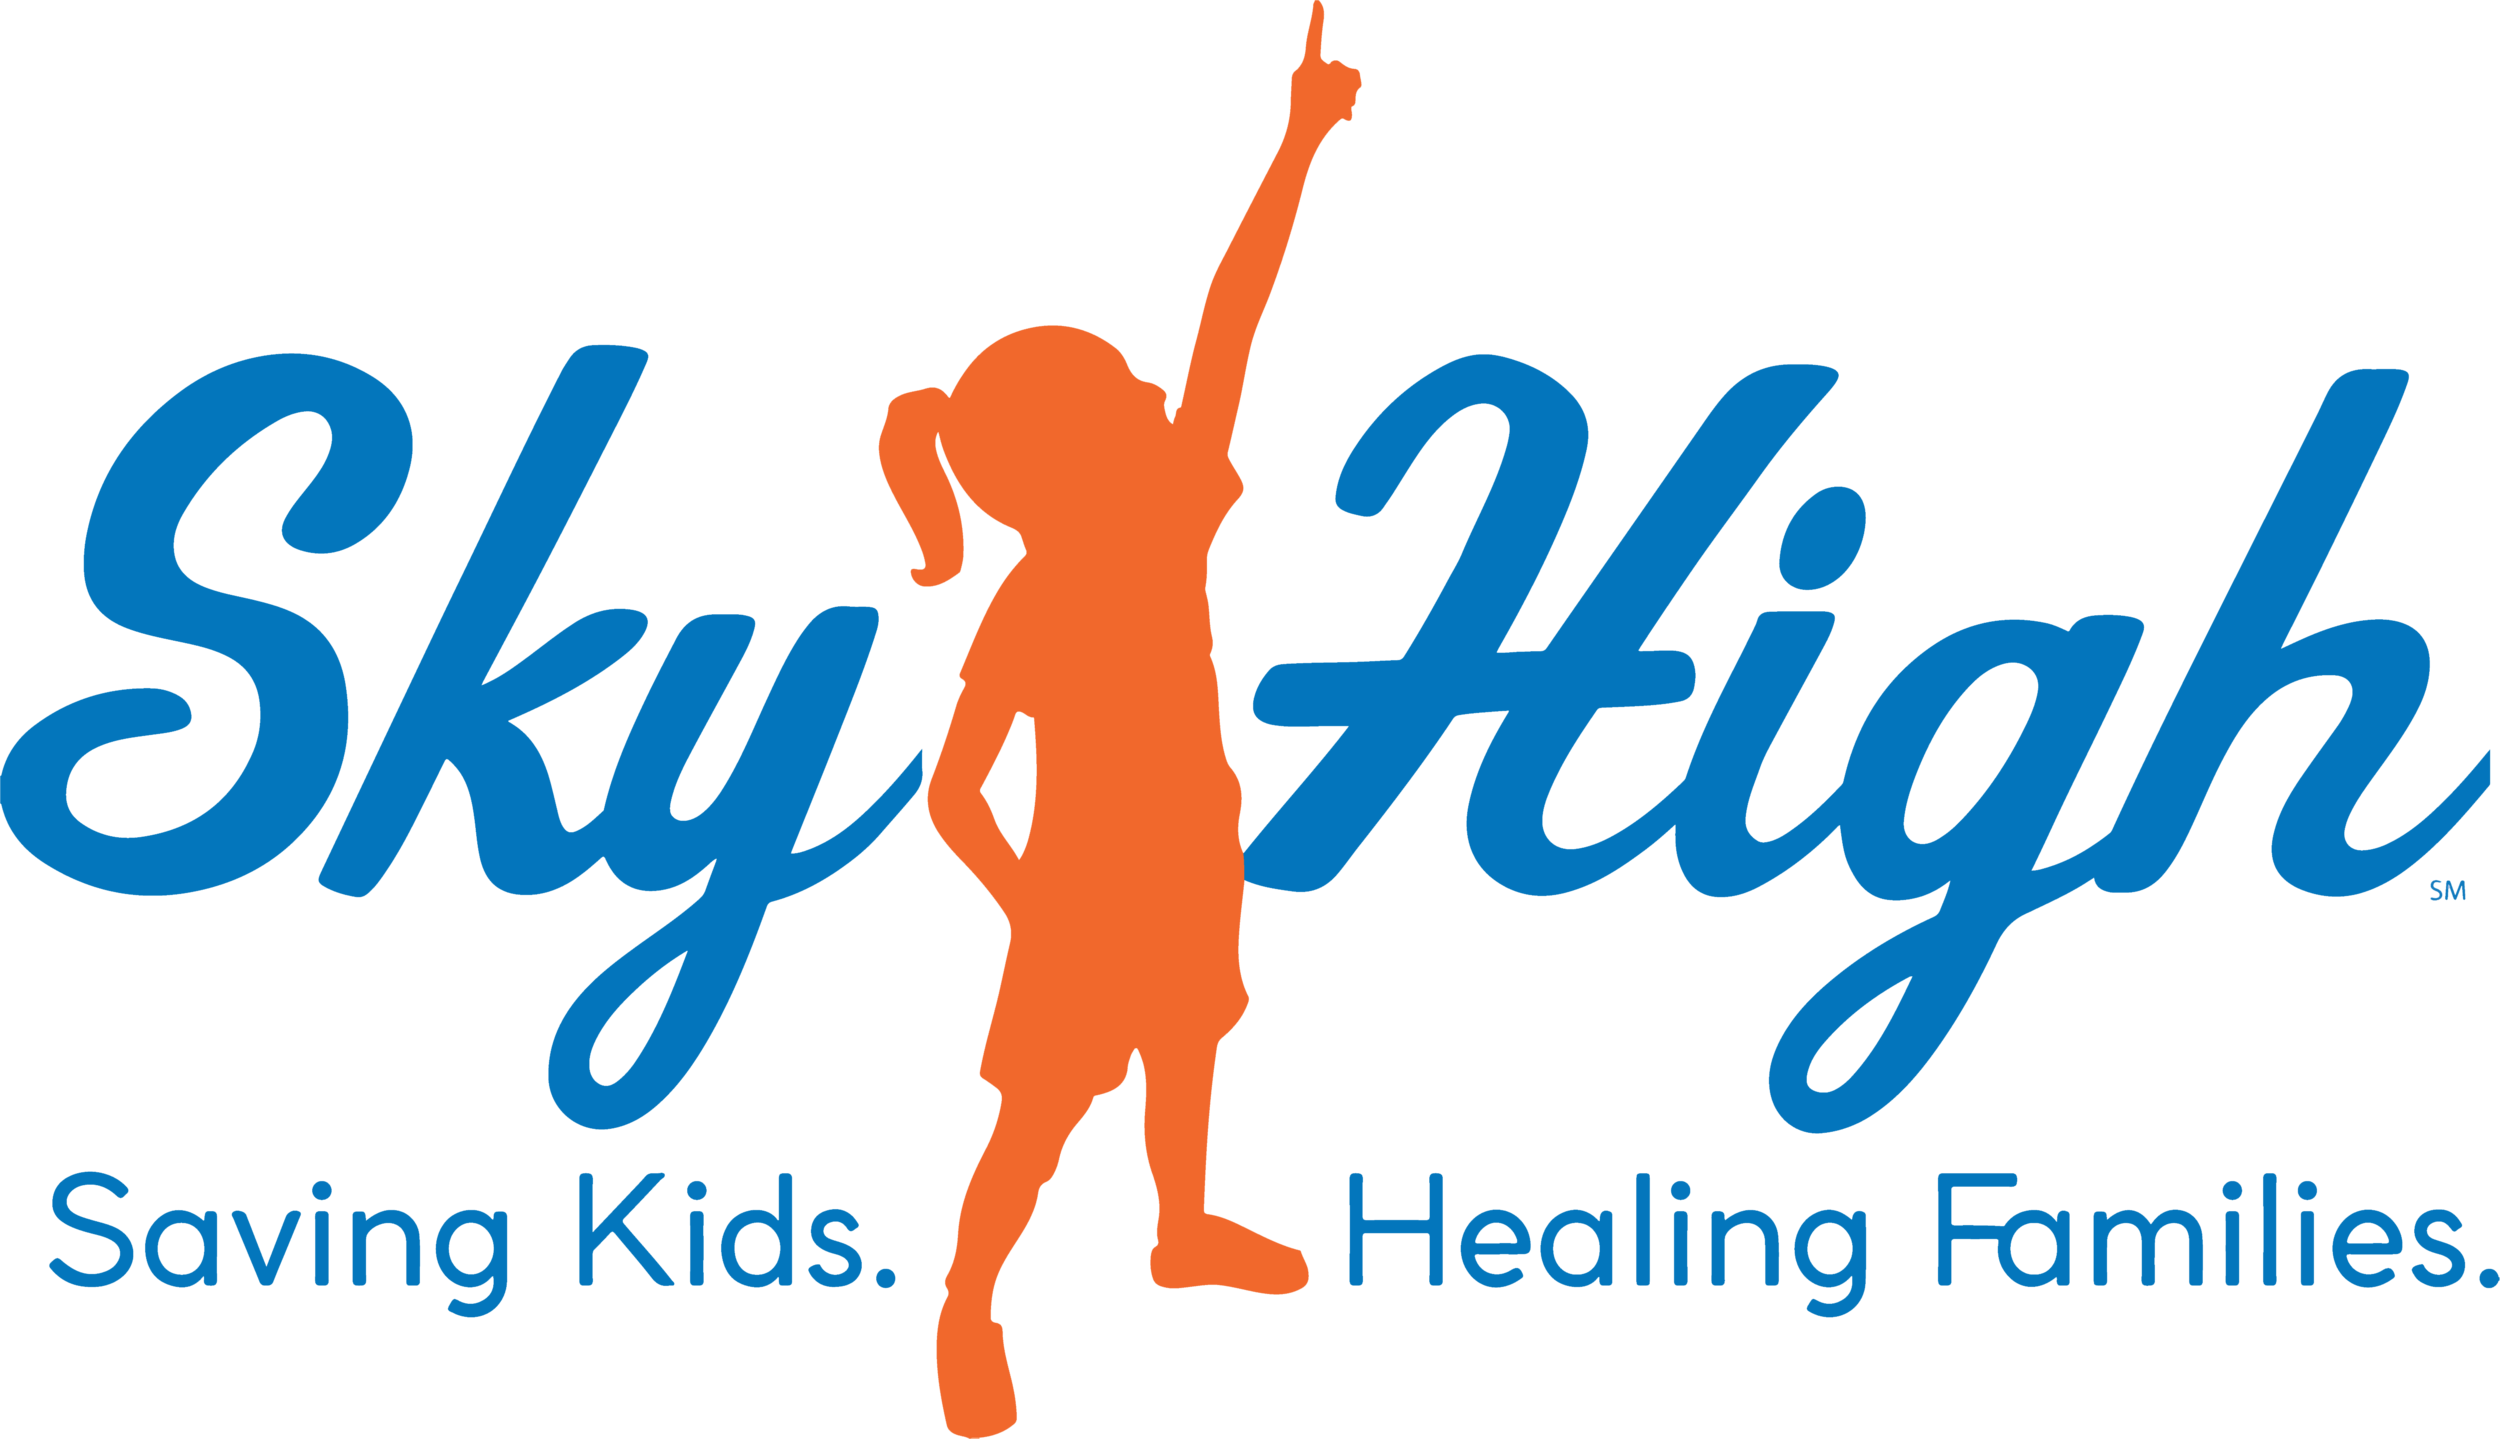 Sky_High_Logo_Slogan_PNG.png